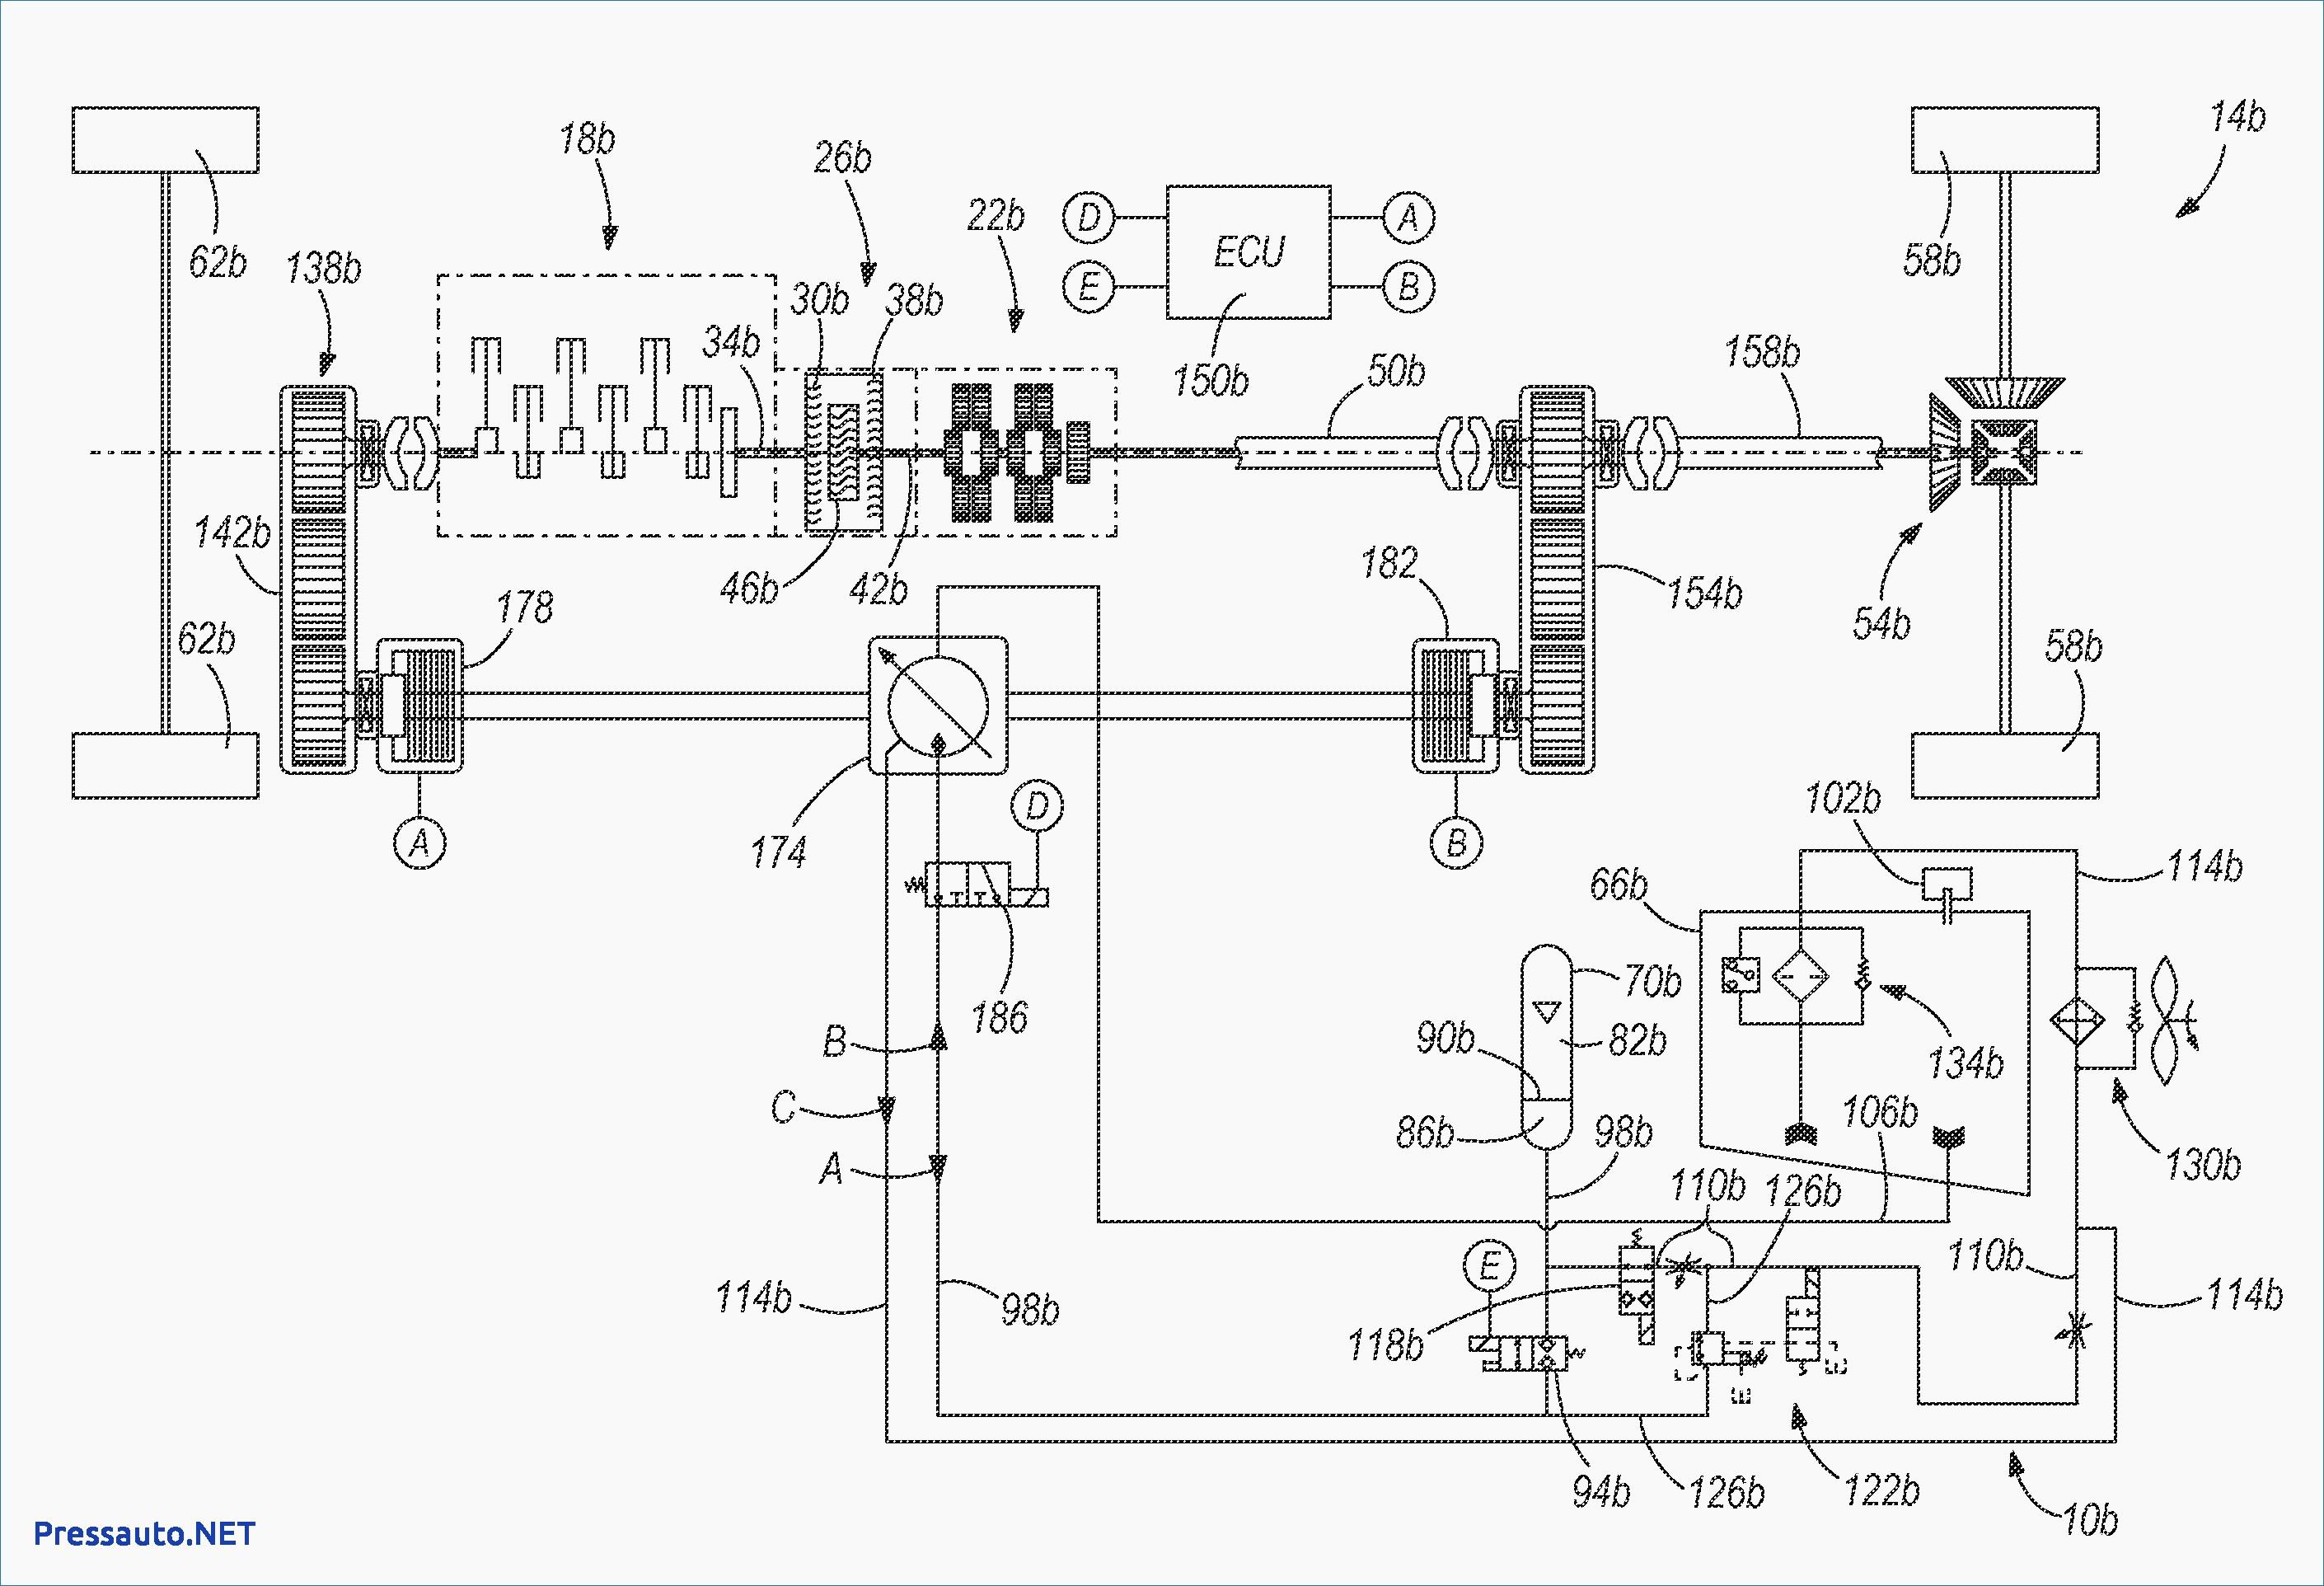 Fleetwood Motorhome Wiring Diagram Highroadny Discovery Amp Plug - Fleetwood Motorhome Wiring Diagram